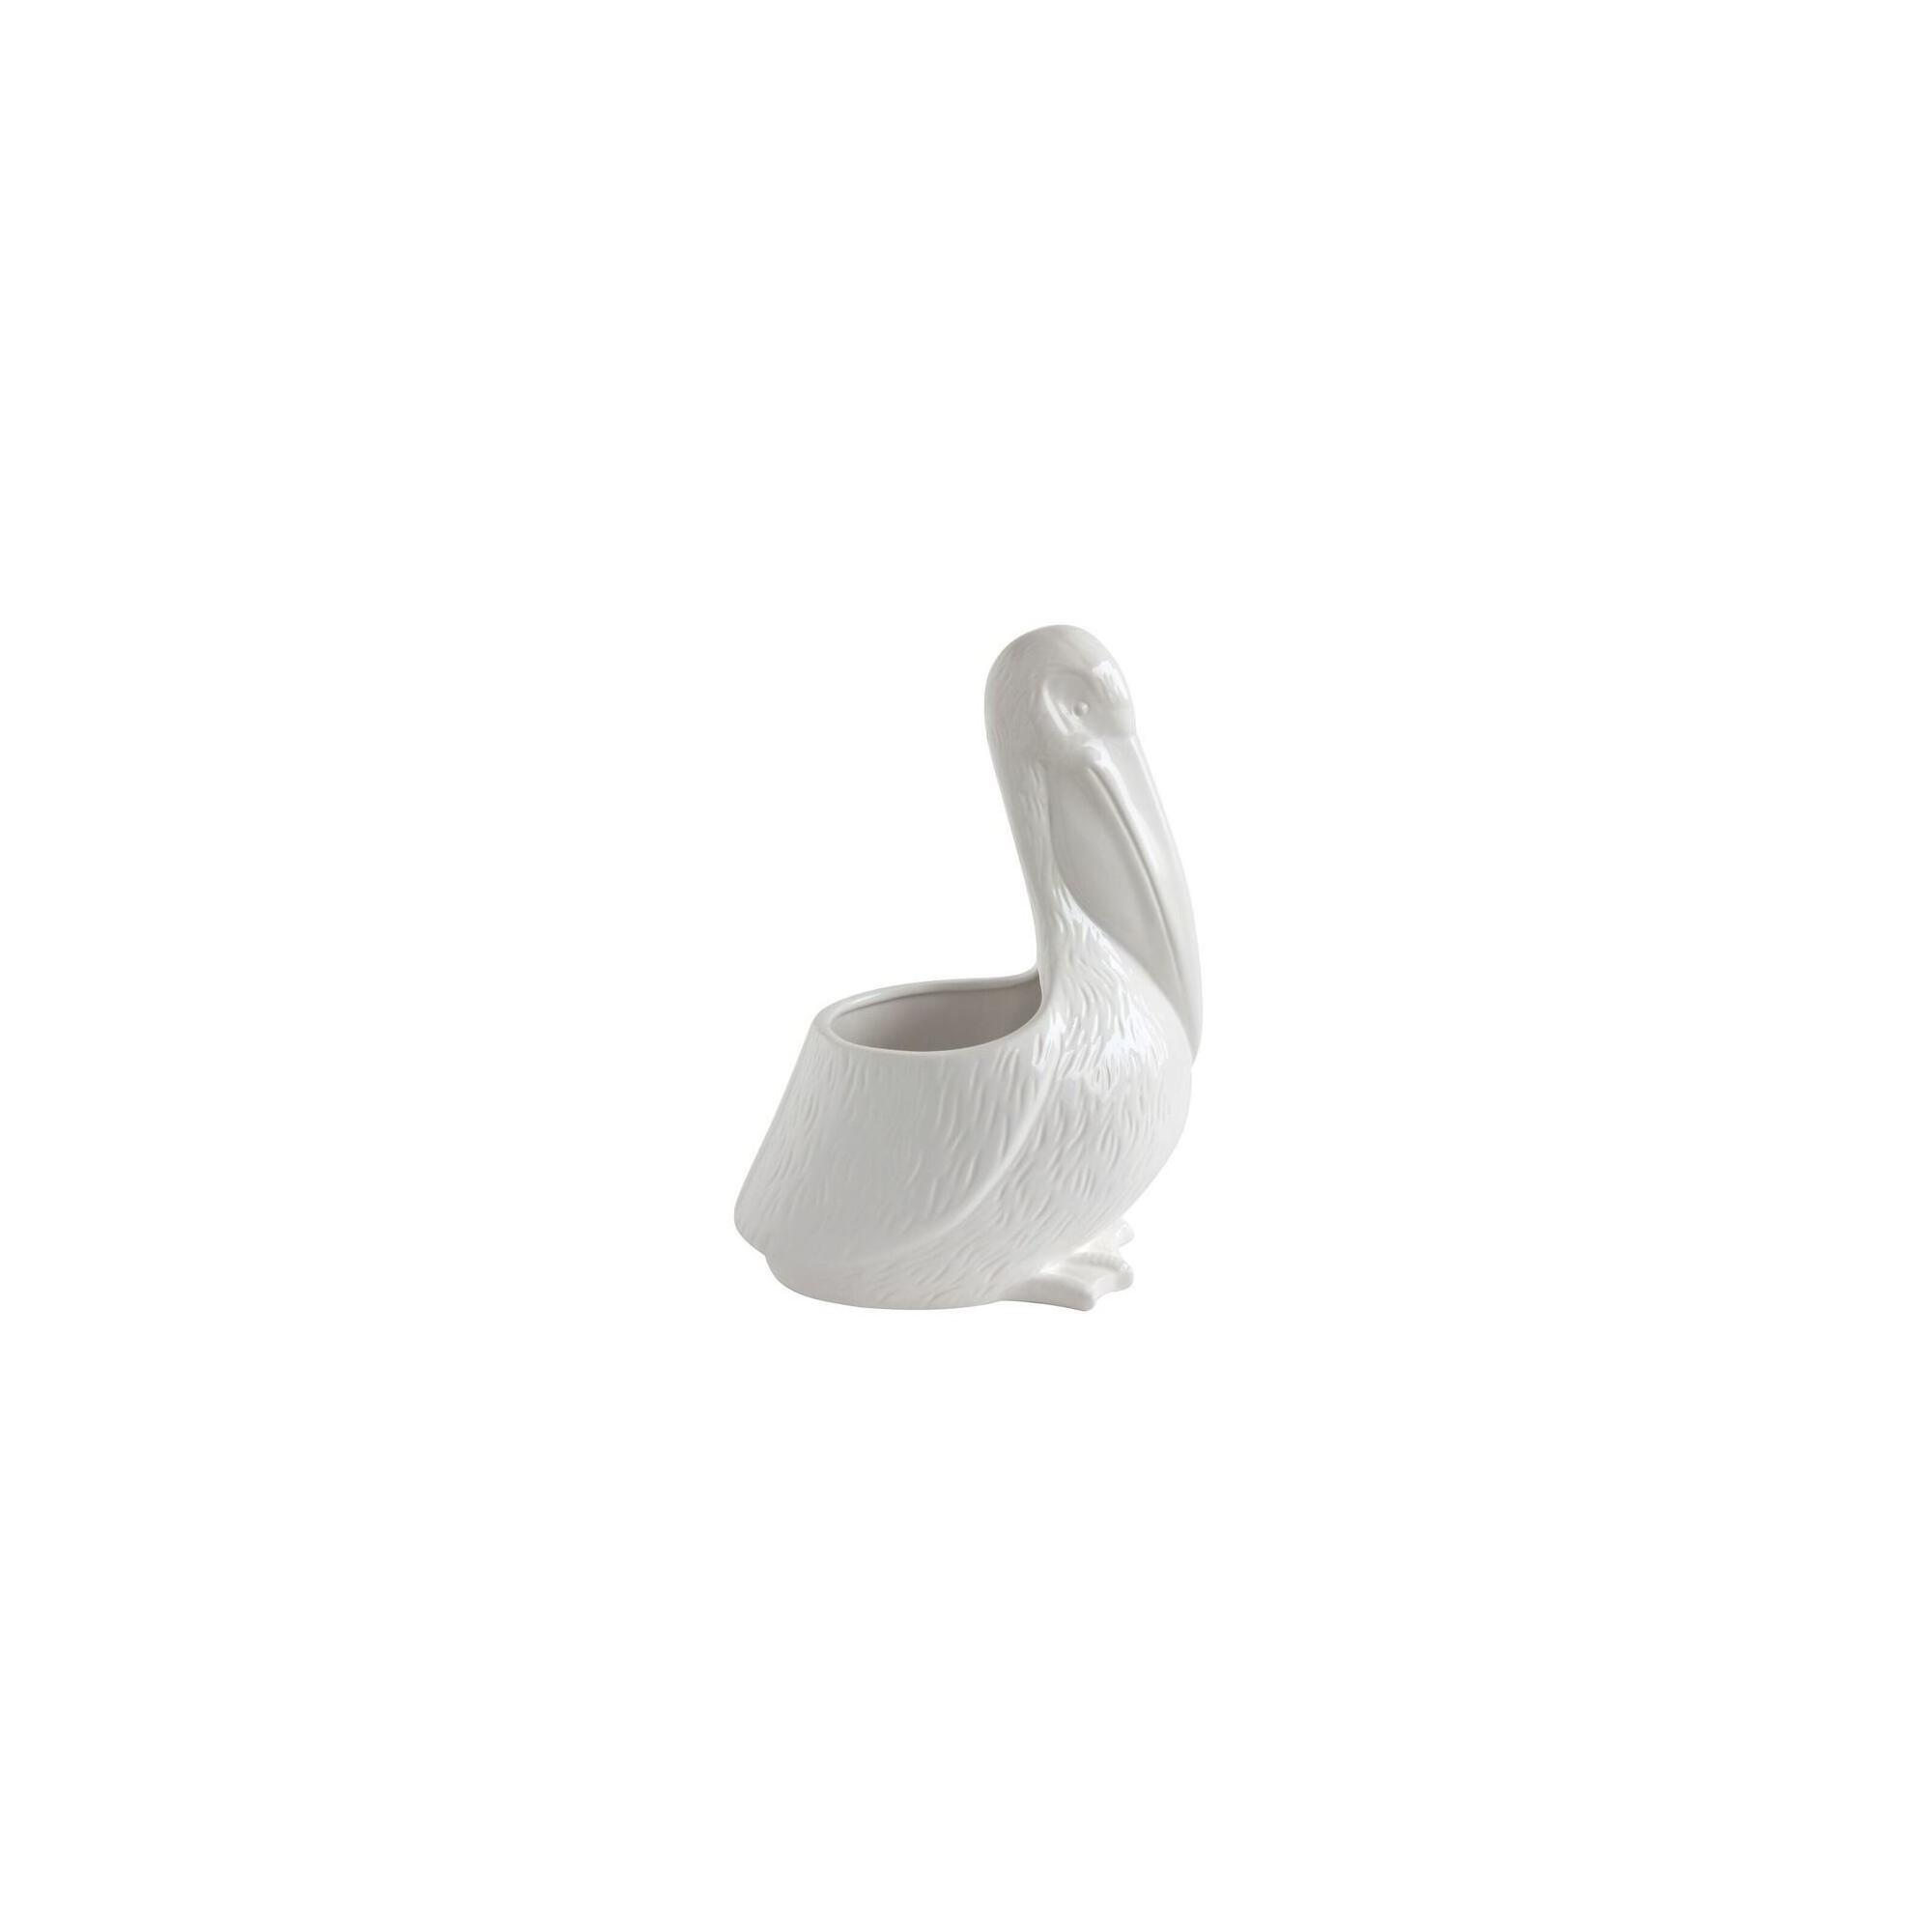 White Pelican Shaped Dolimite Planter - 3R Studios